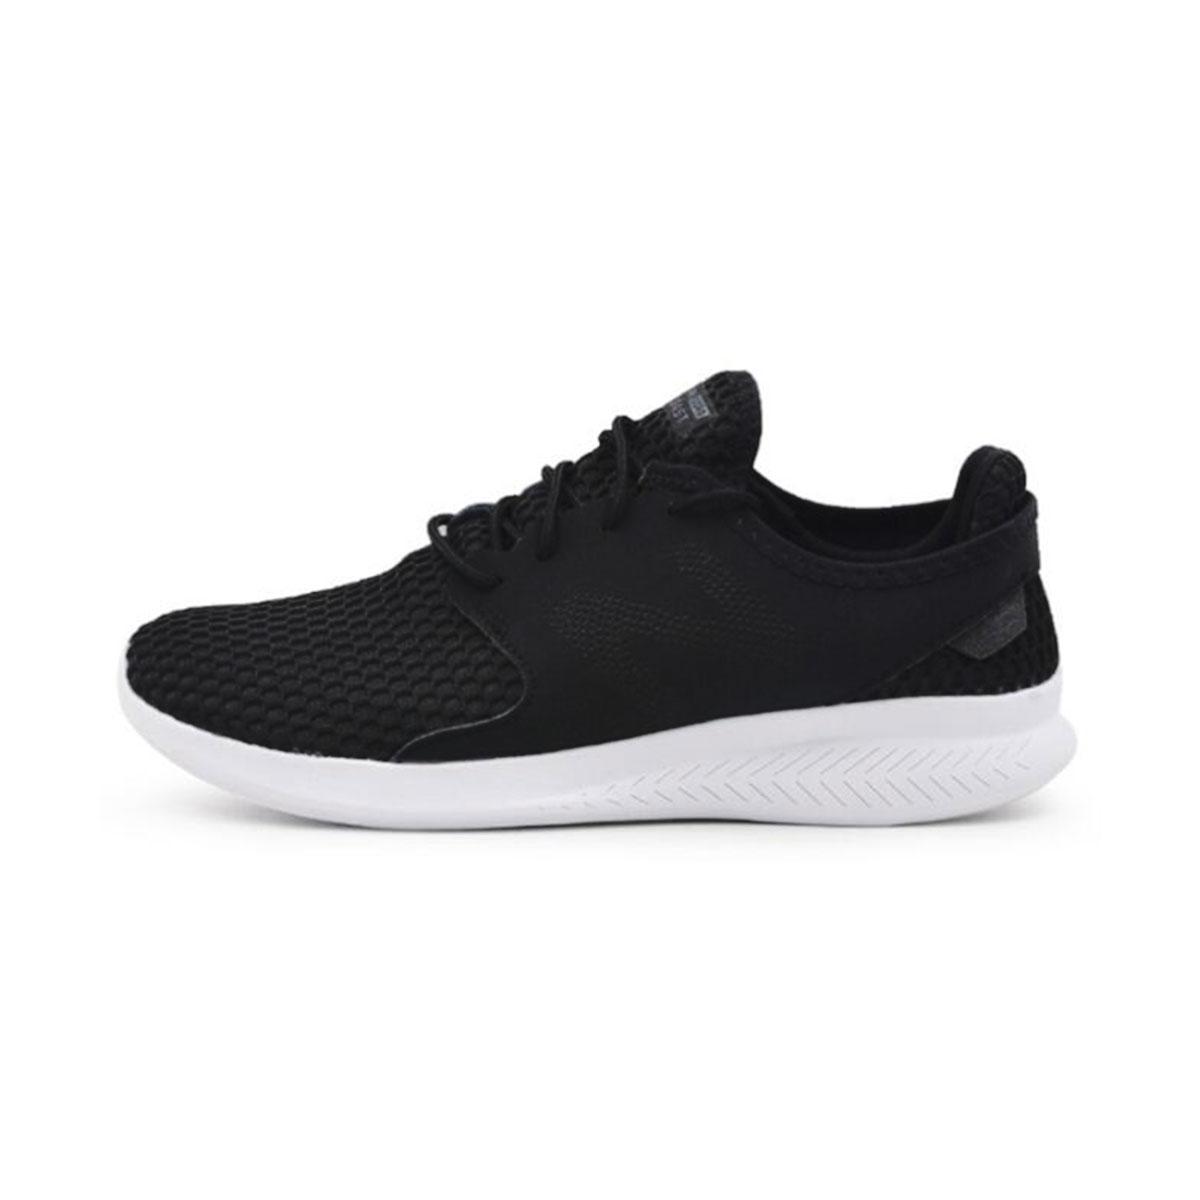 new balance 中性休闲运动鞋 MCOASL3K-D 黑色 41.5